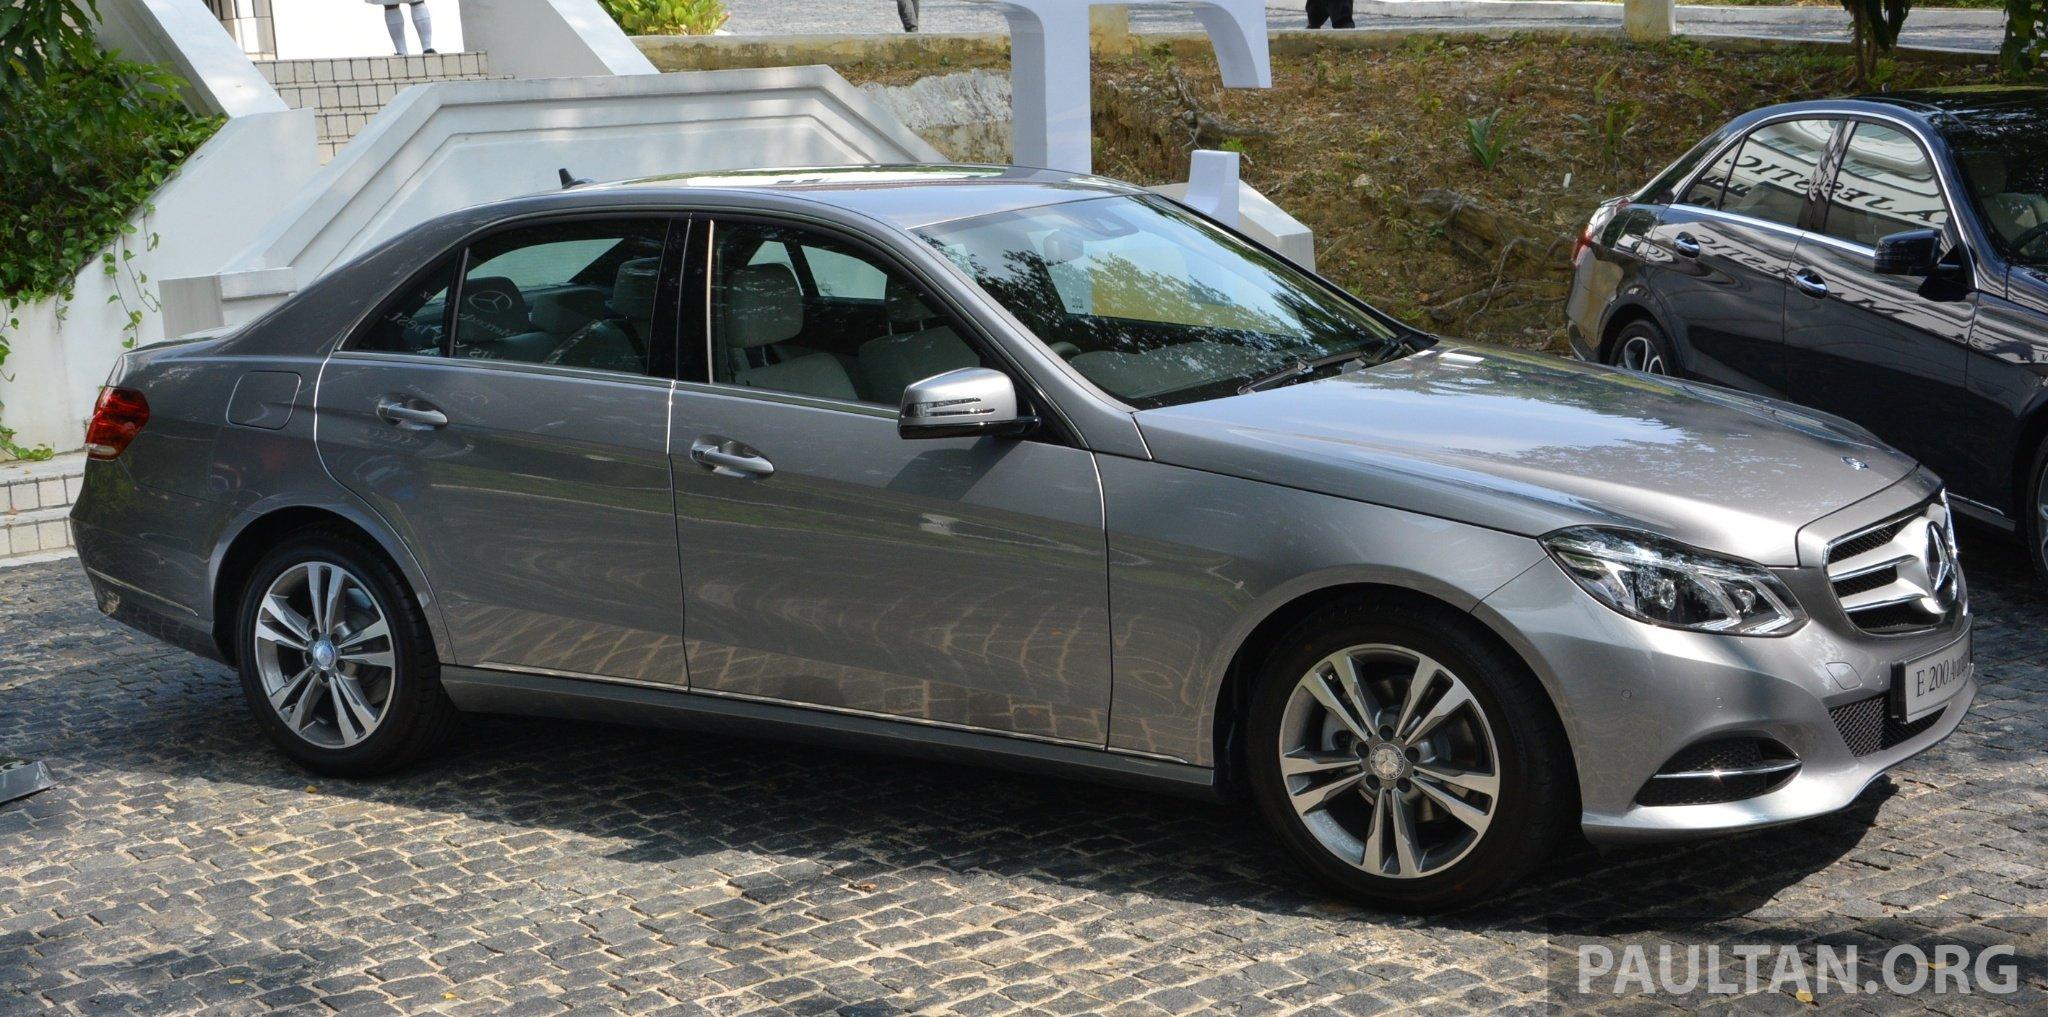 W212 mercedes benz e class facelift launched e 200 avantgarde and e 250 avantgarde rm367k